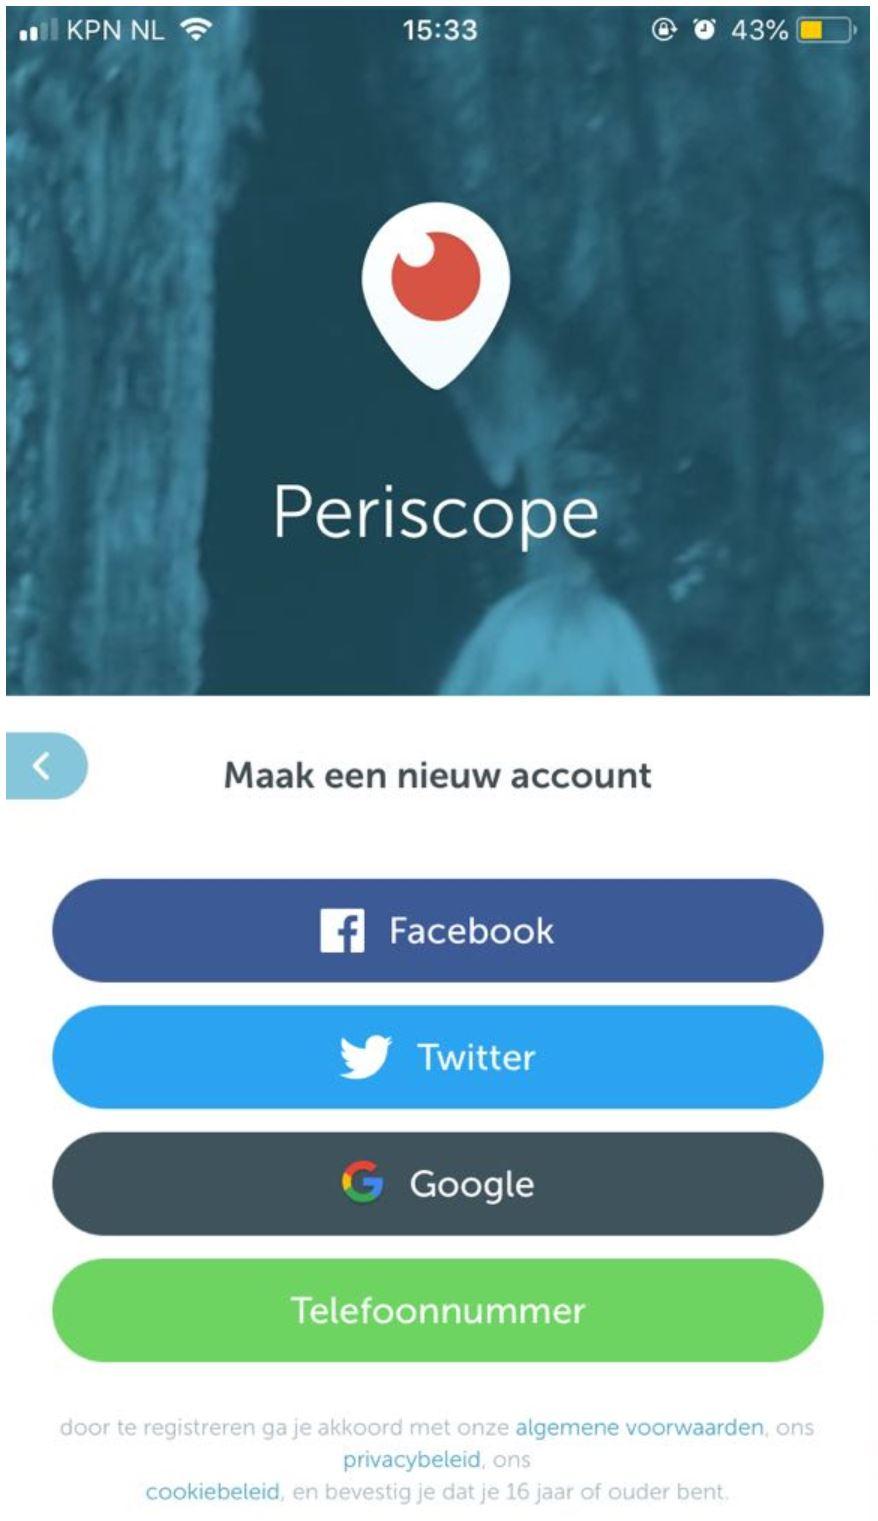 periscope_page01.JPG